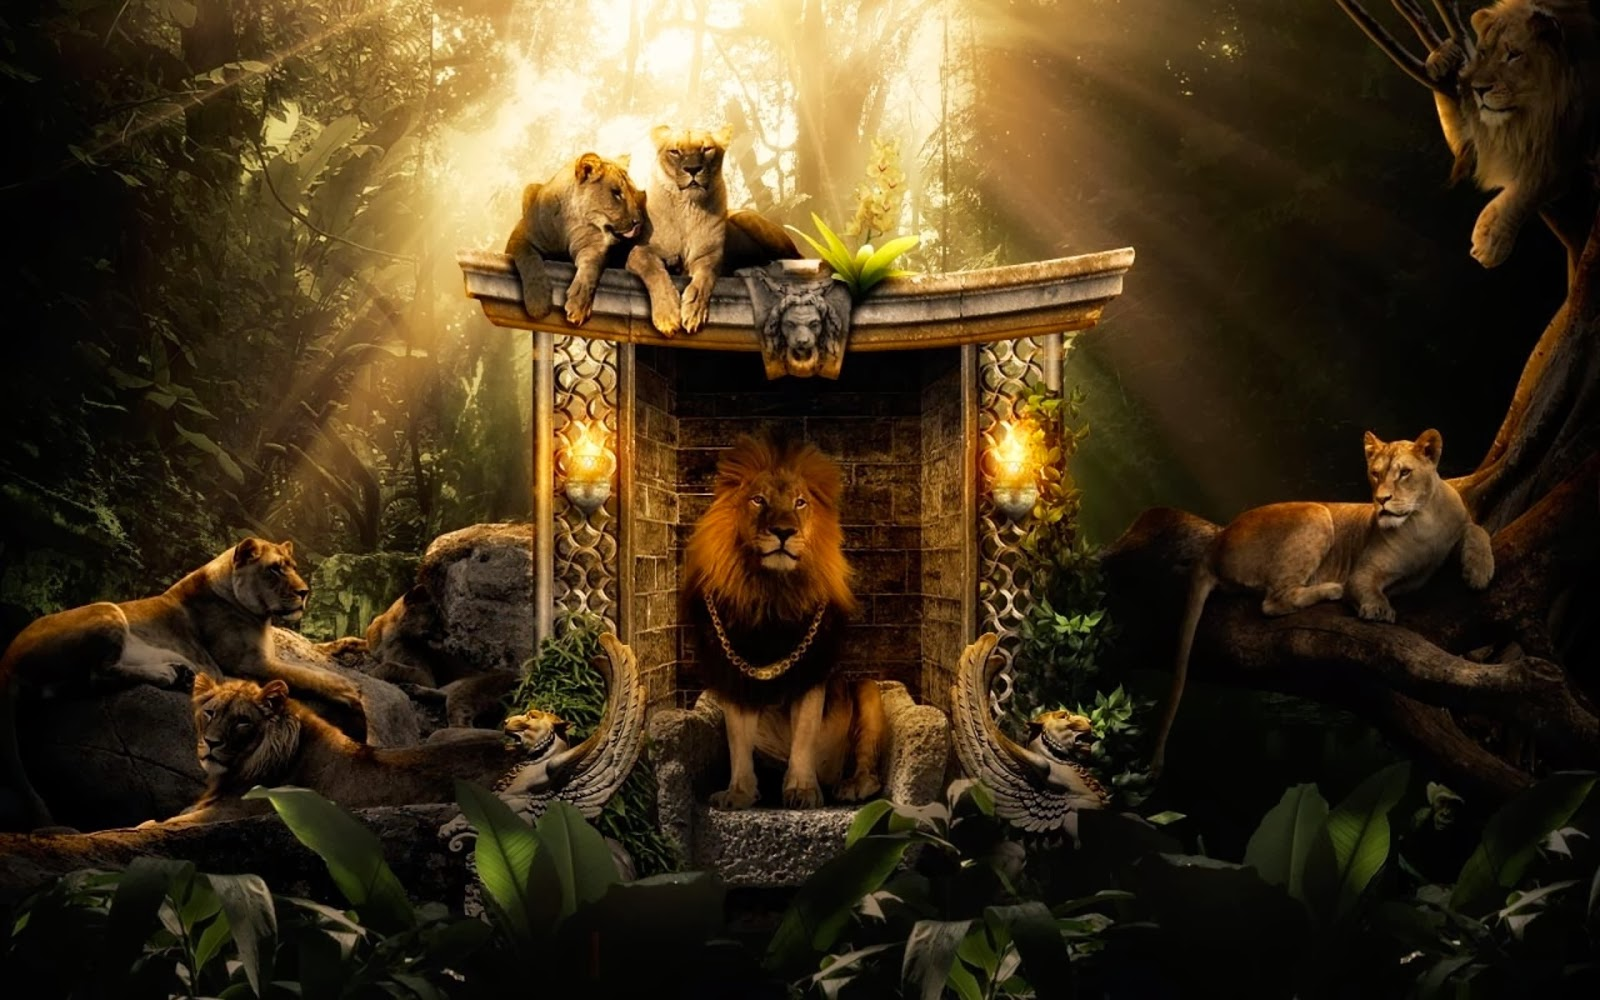 "<img src=""http://1.bp.blogspot.com/-tZzV3Xh6cmc/UuFikpeR-bI/AAAAAAAAJ_A/45SjH9T_uAY/s1600/lions-jungle-wallpaper.jpg"" alt=""lions jungle wallpaper"" />"